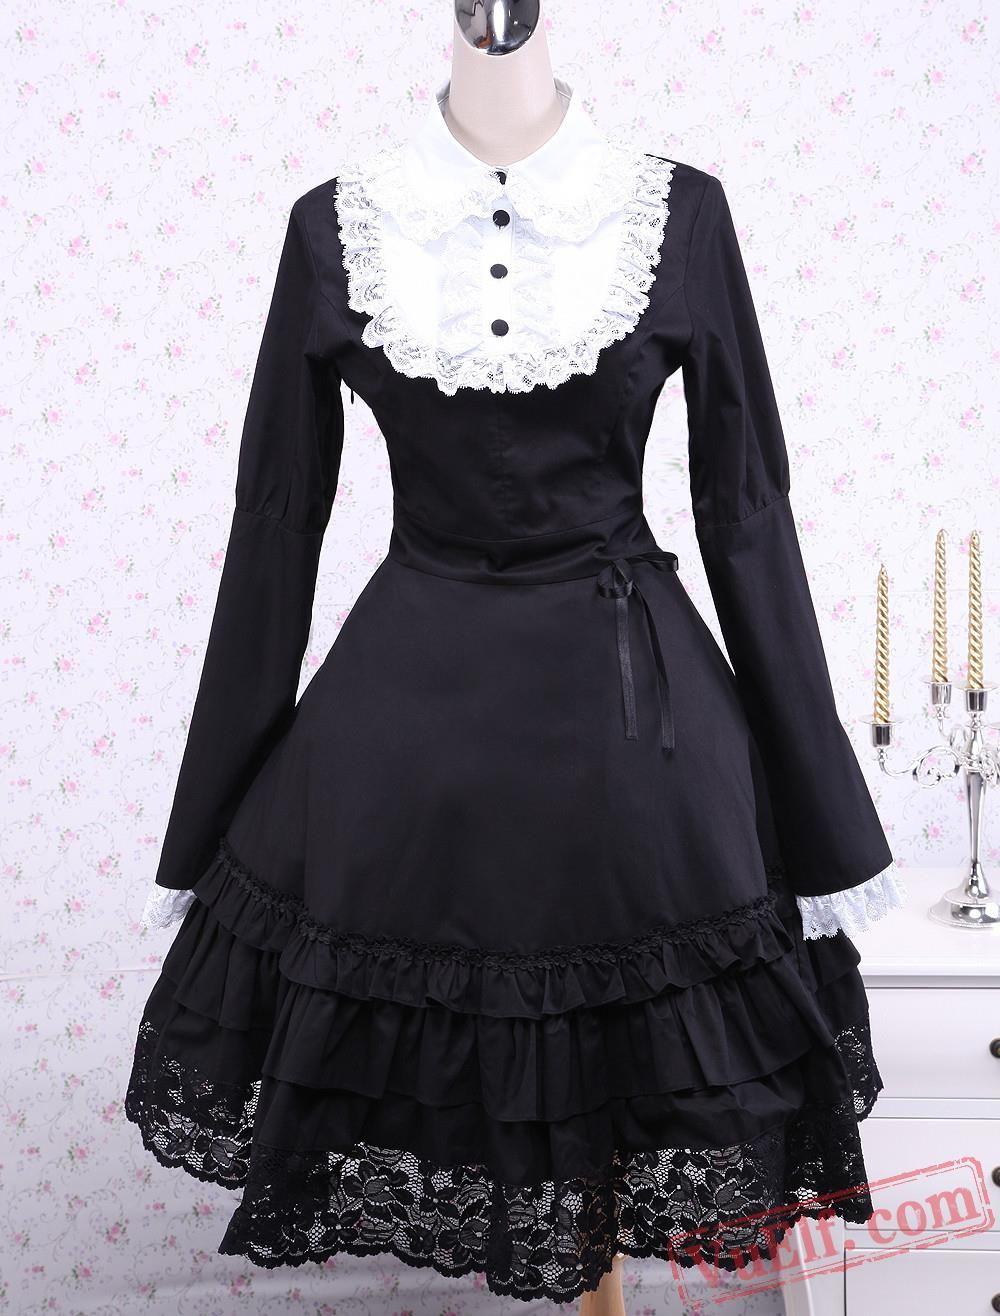 Black cotton lace long sleeves ruffle gothic lolita dress gothic